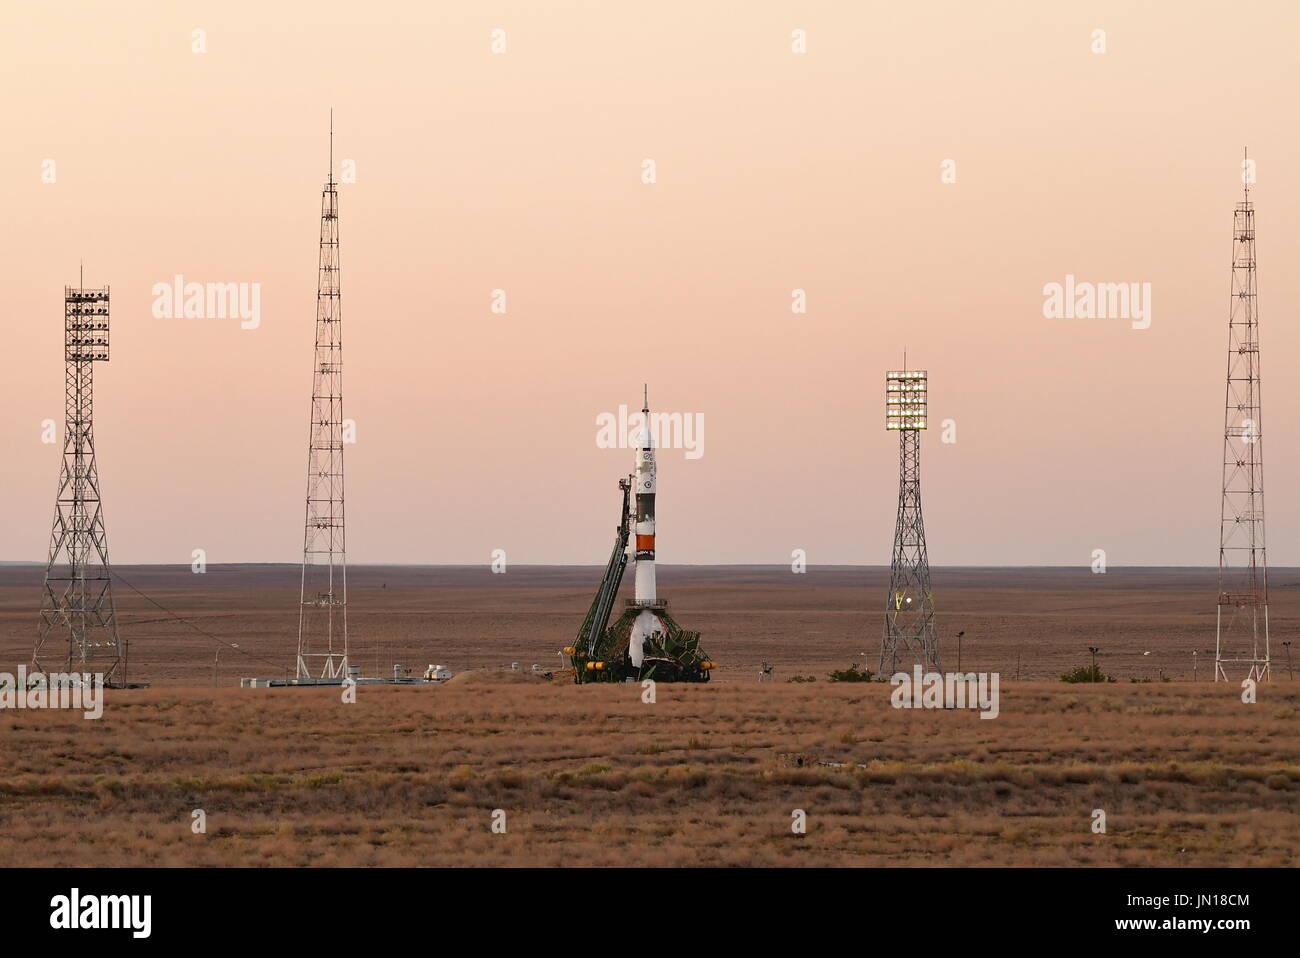 Baikonur, Kazakhstan 28th July, 2017 BAIKONUR, KAZAKHSTAN -- JULY 28, 2017: The Soyuz-FG rocket booster with the Soyuz MS-05 spaceship on the launch pad at Baikonur Cosmodrome. Yuri Smityuk/TASS Credit: Yuri Smityuk/TASS/Alamy Live News - Stock Image